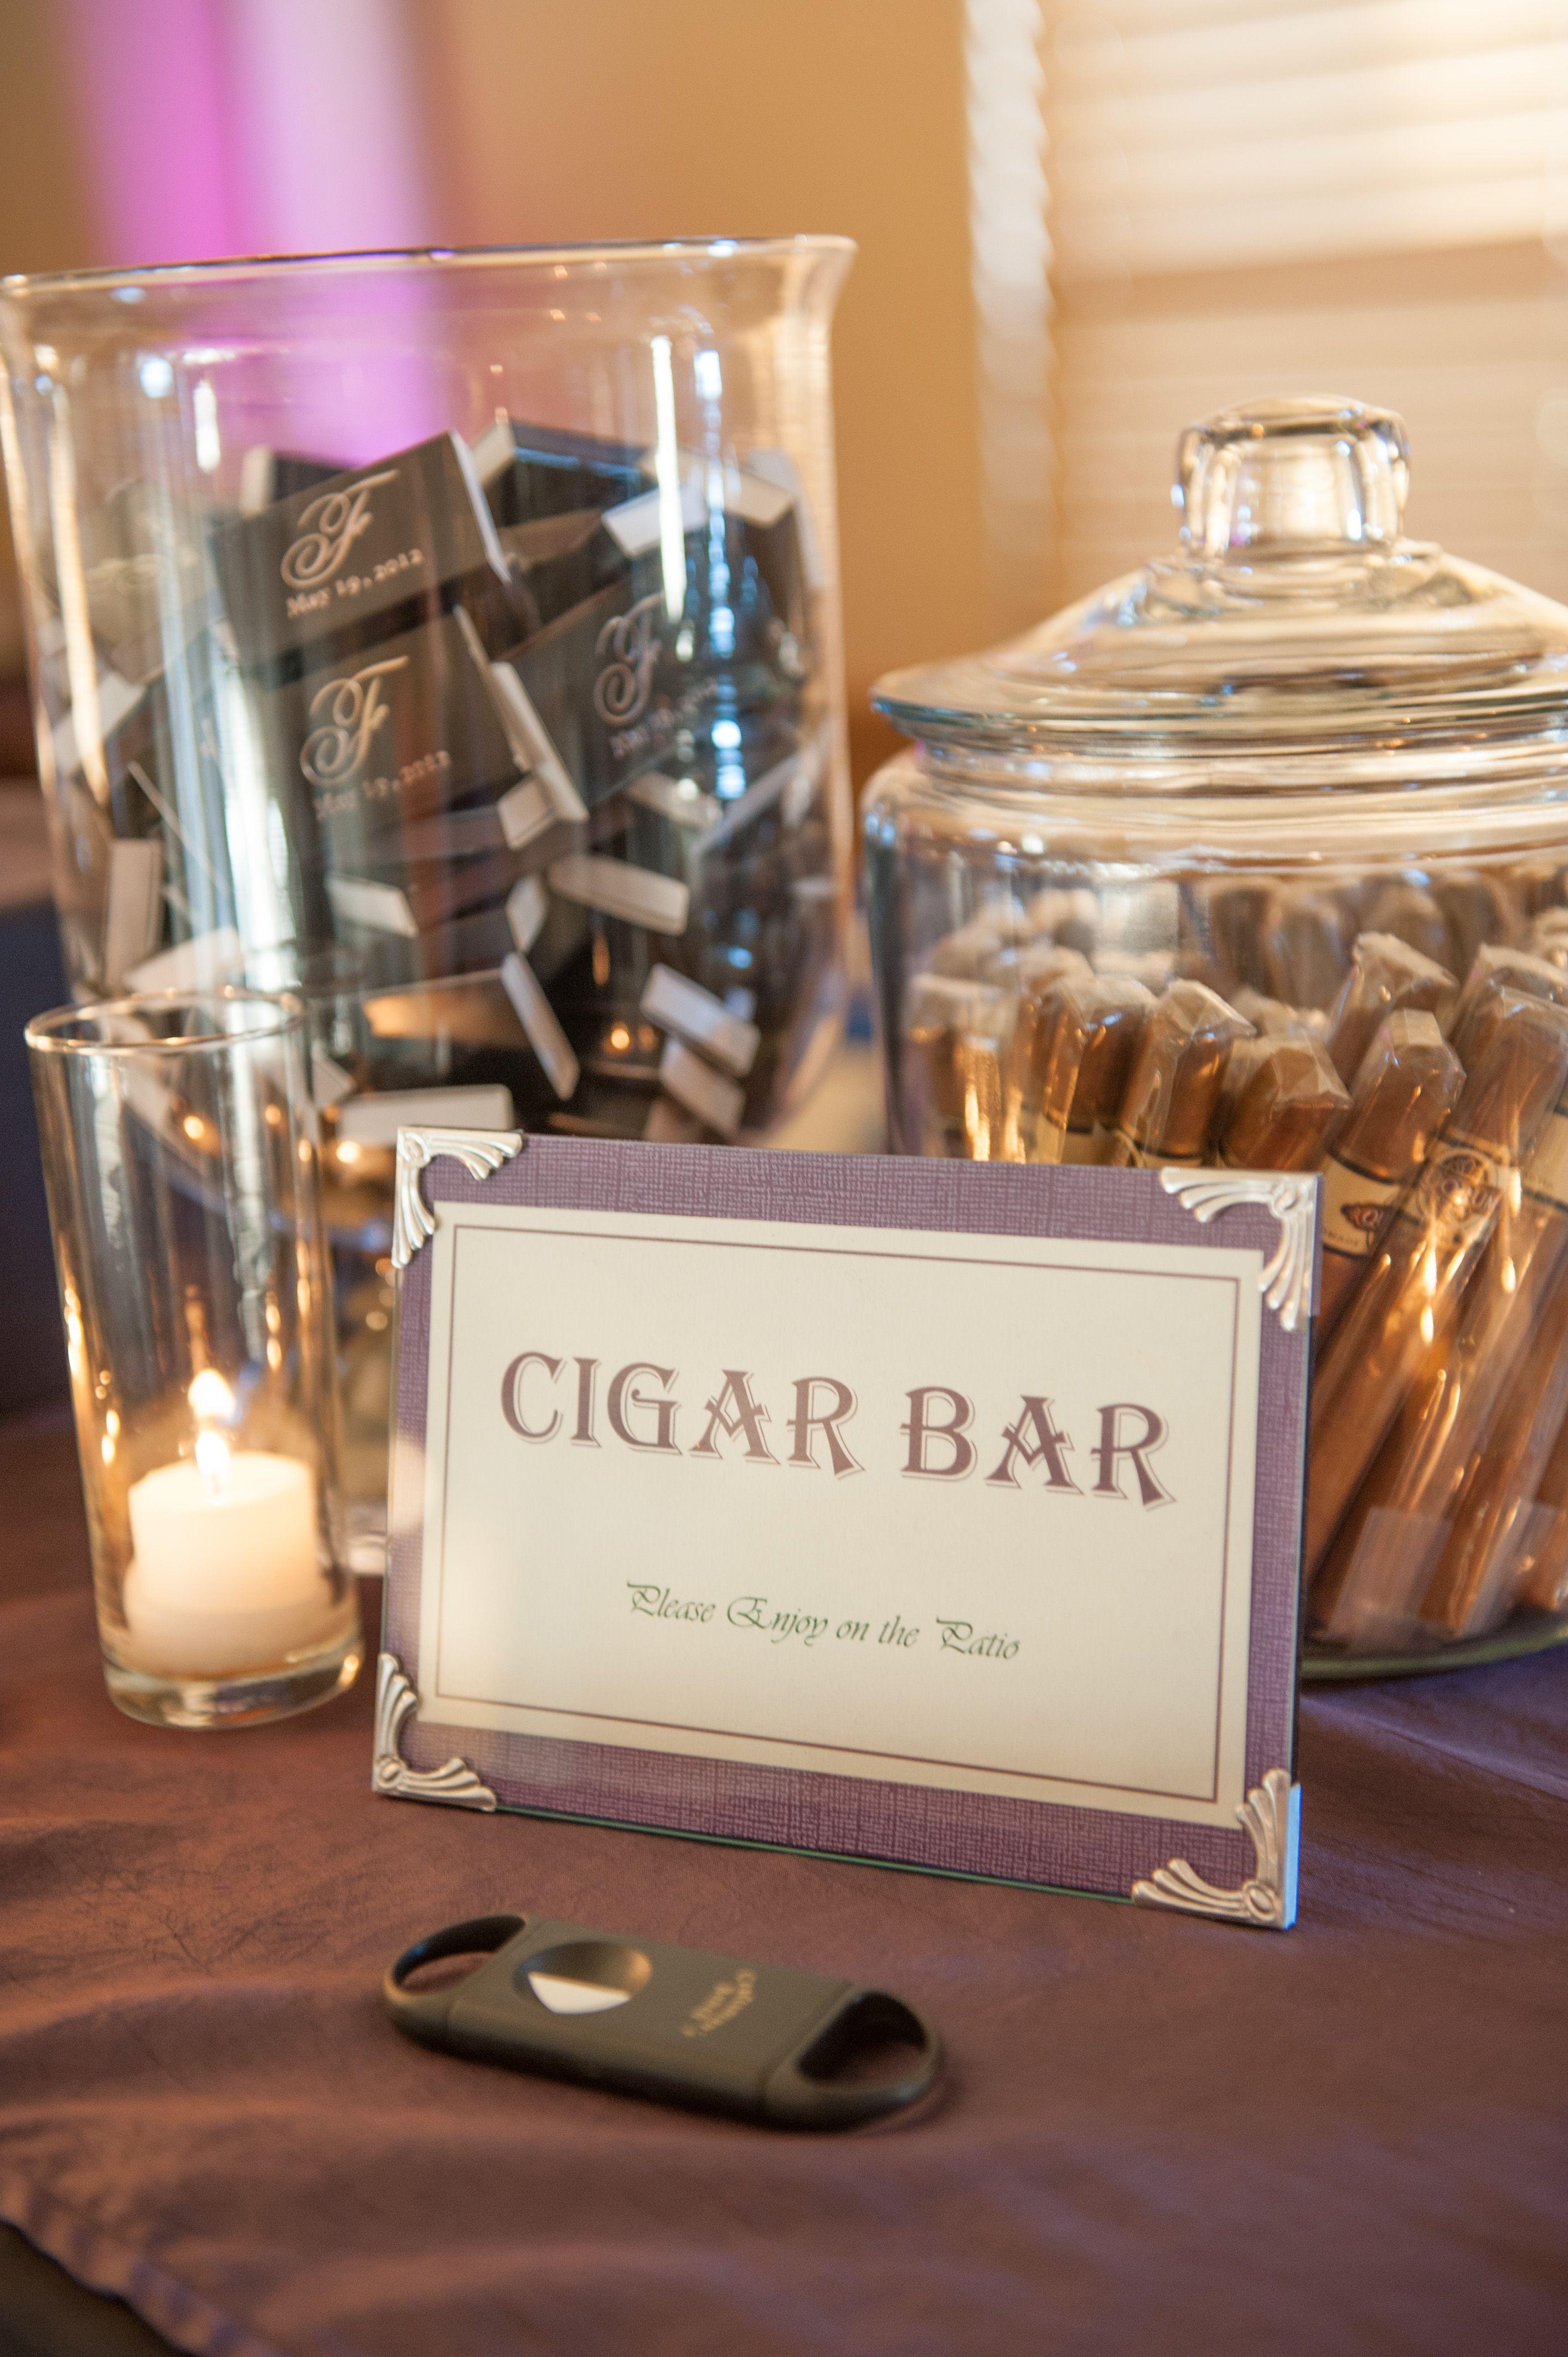 Cigar Bar Something For The Guys Brideside Wedding Details